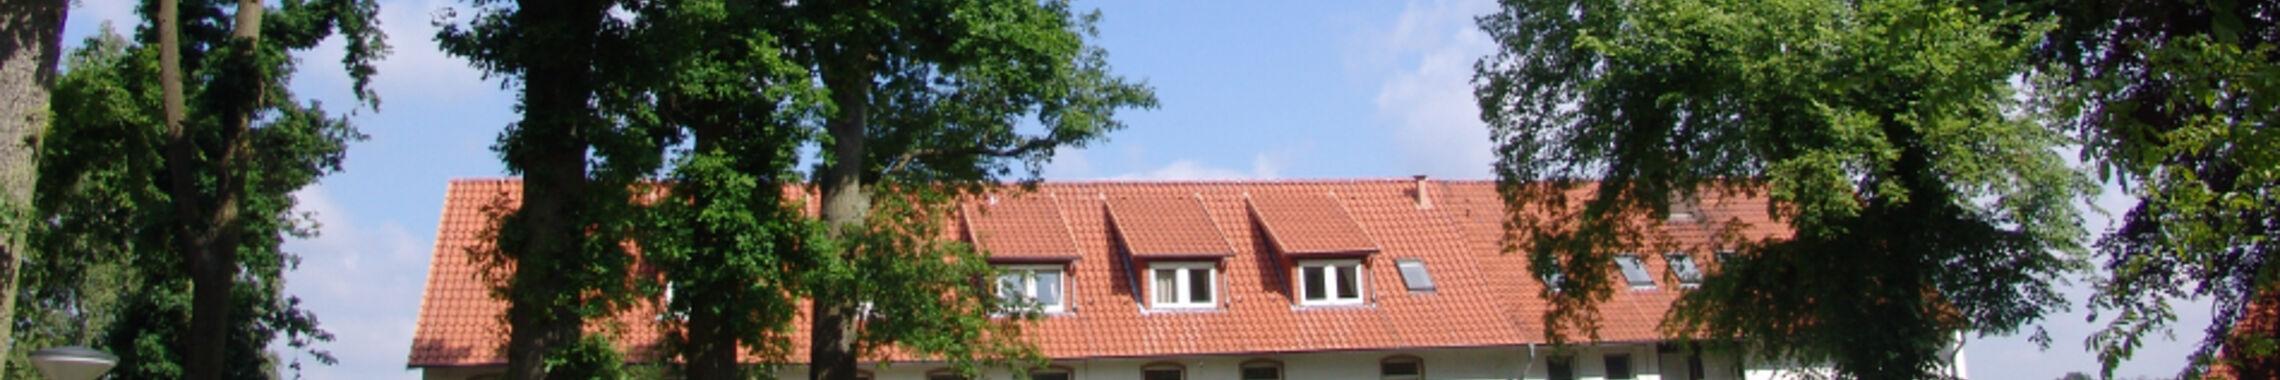 heimvolkshochschule_loccum_kopfgrafik_3